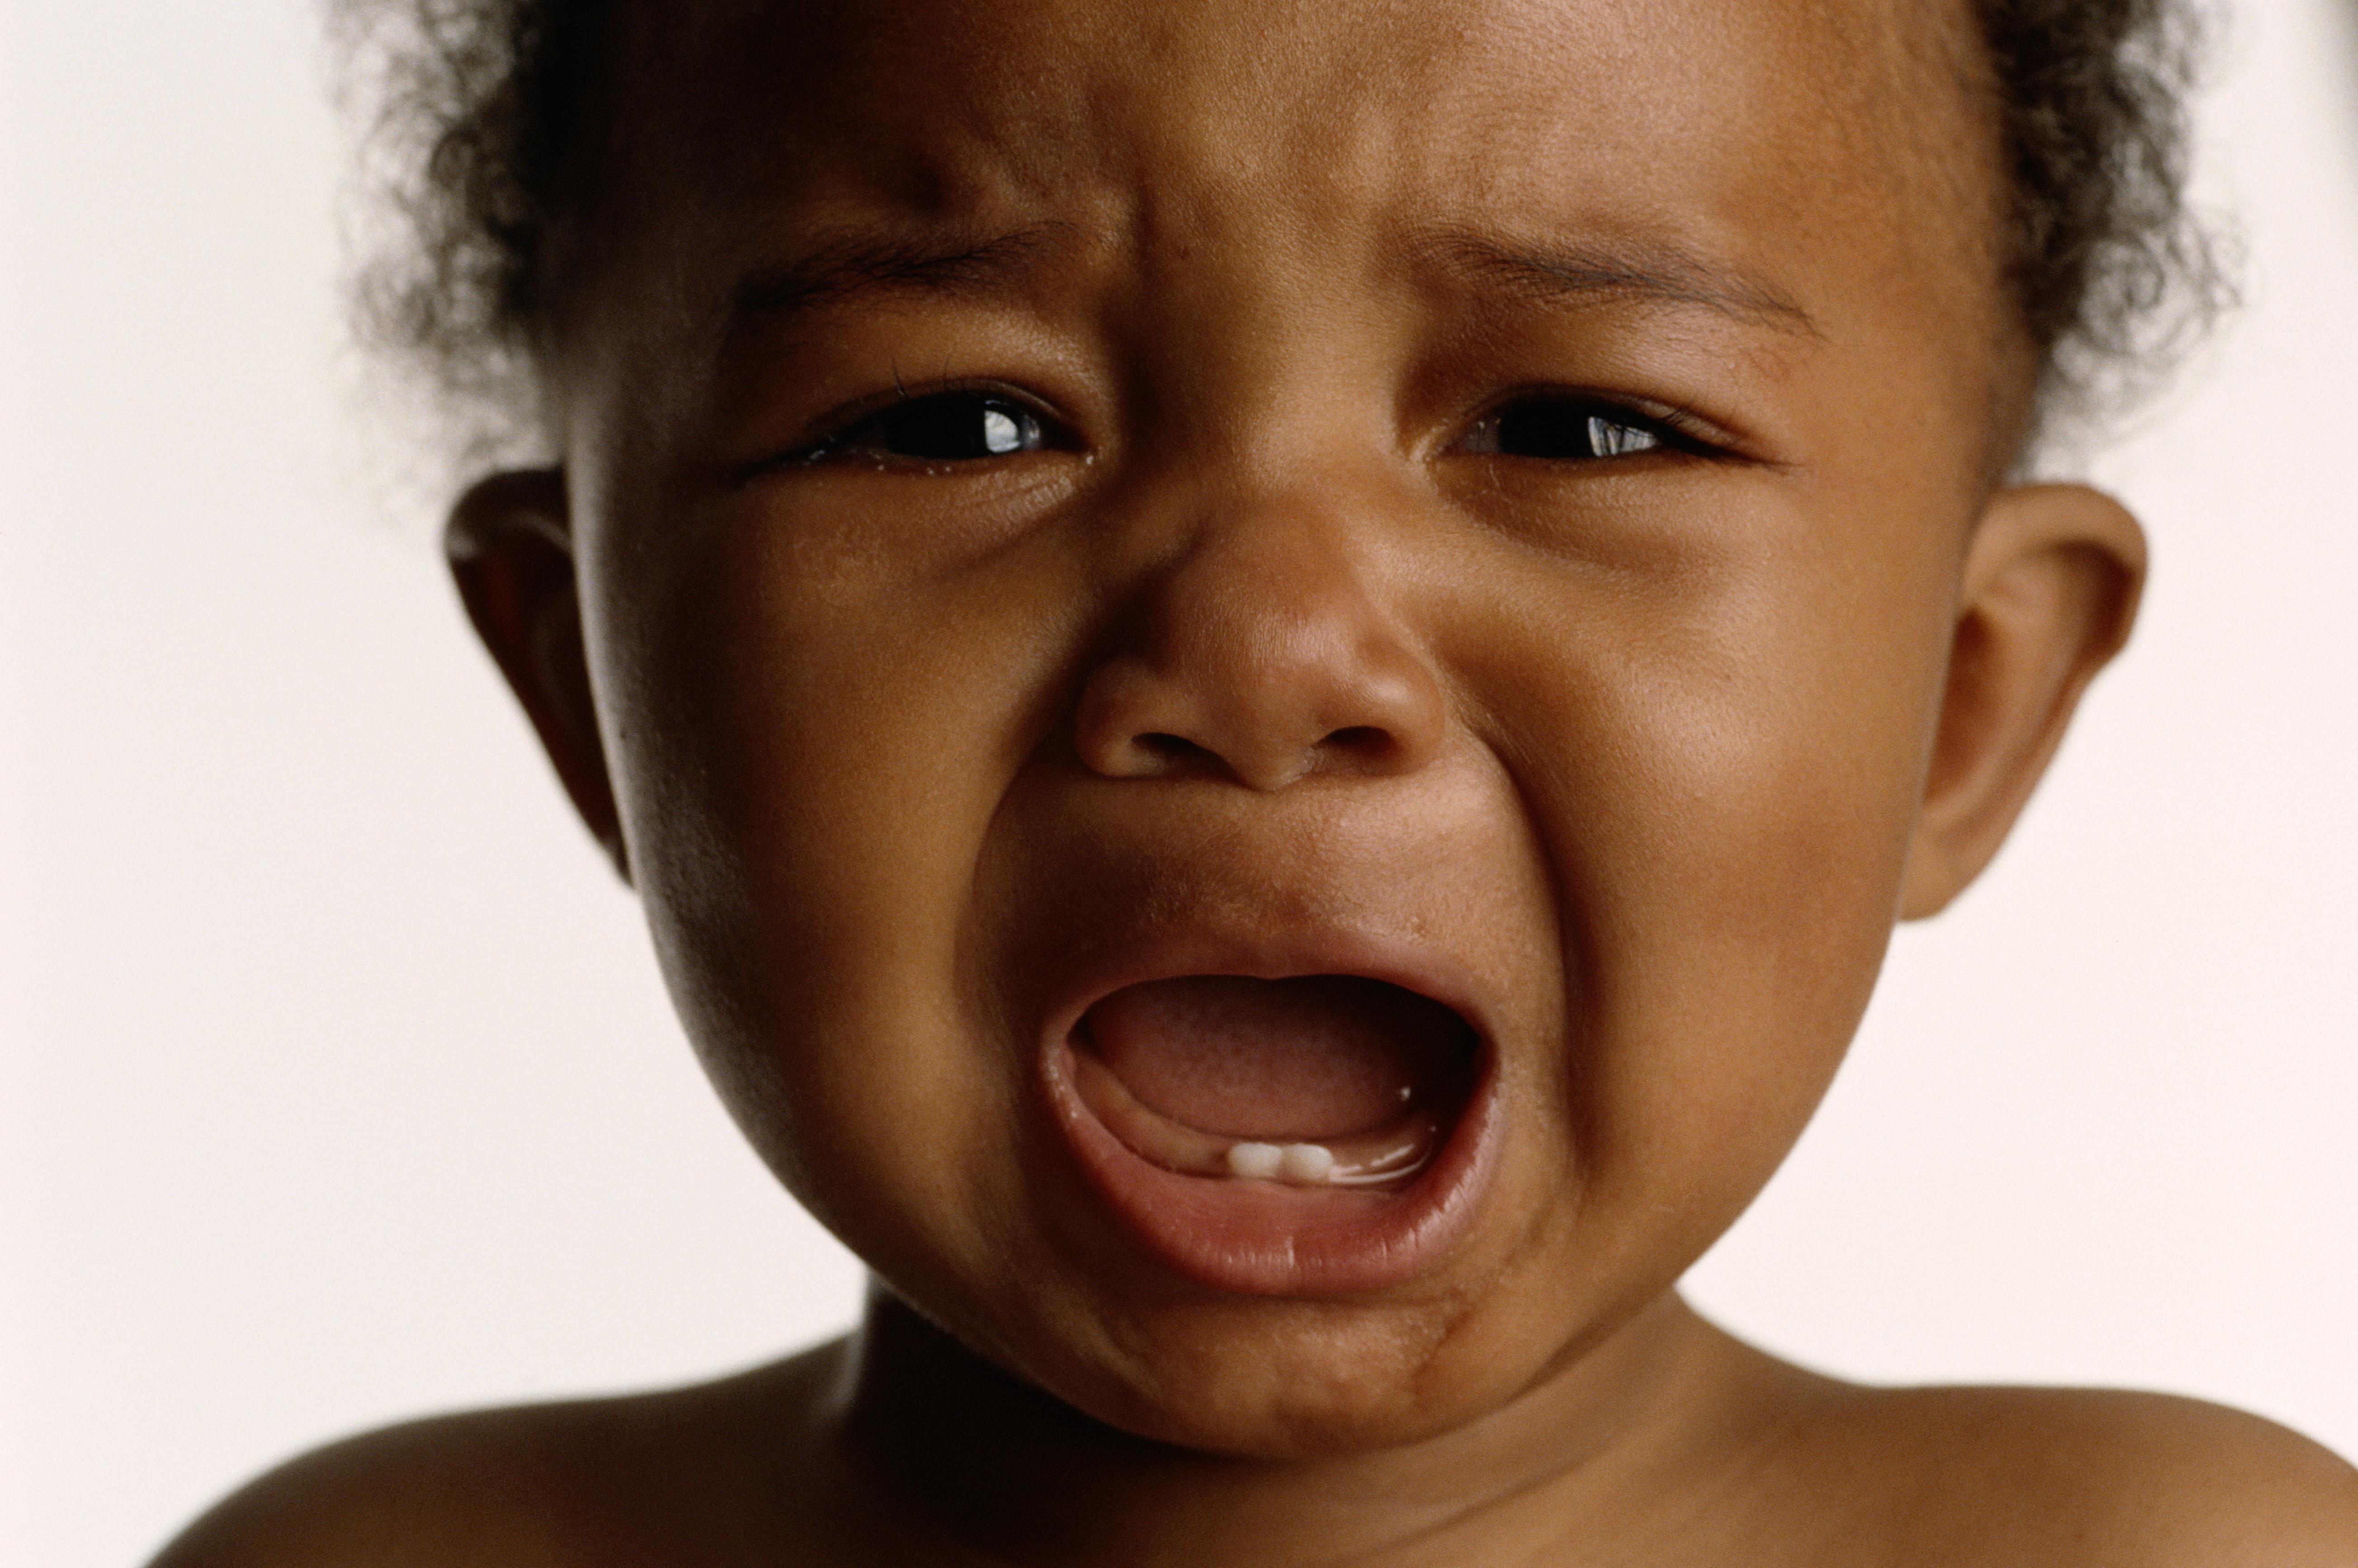 BLACK BABY CRYING